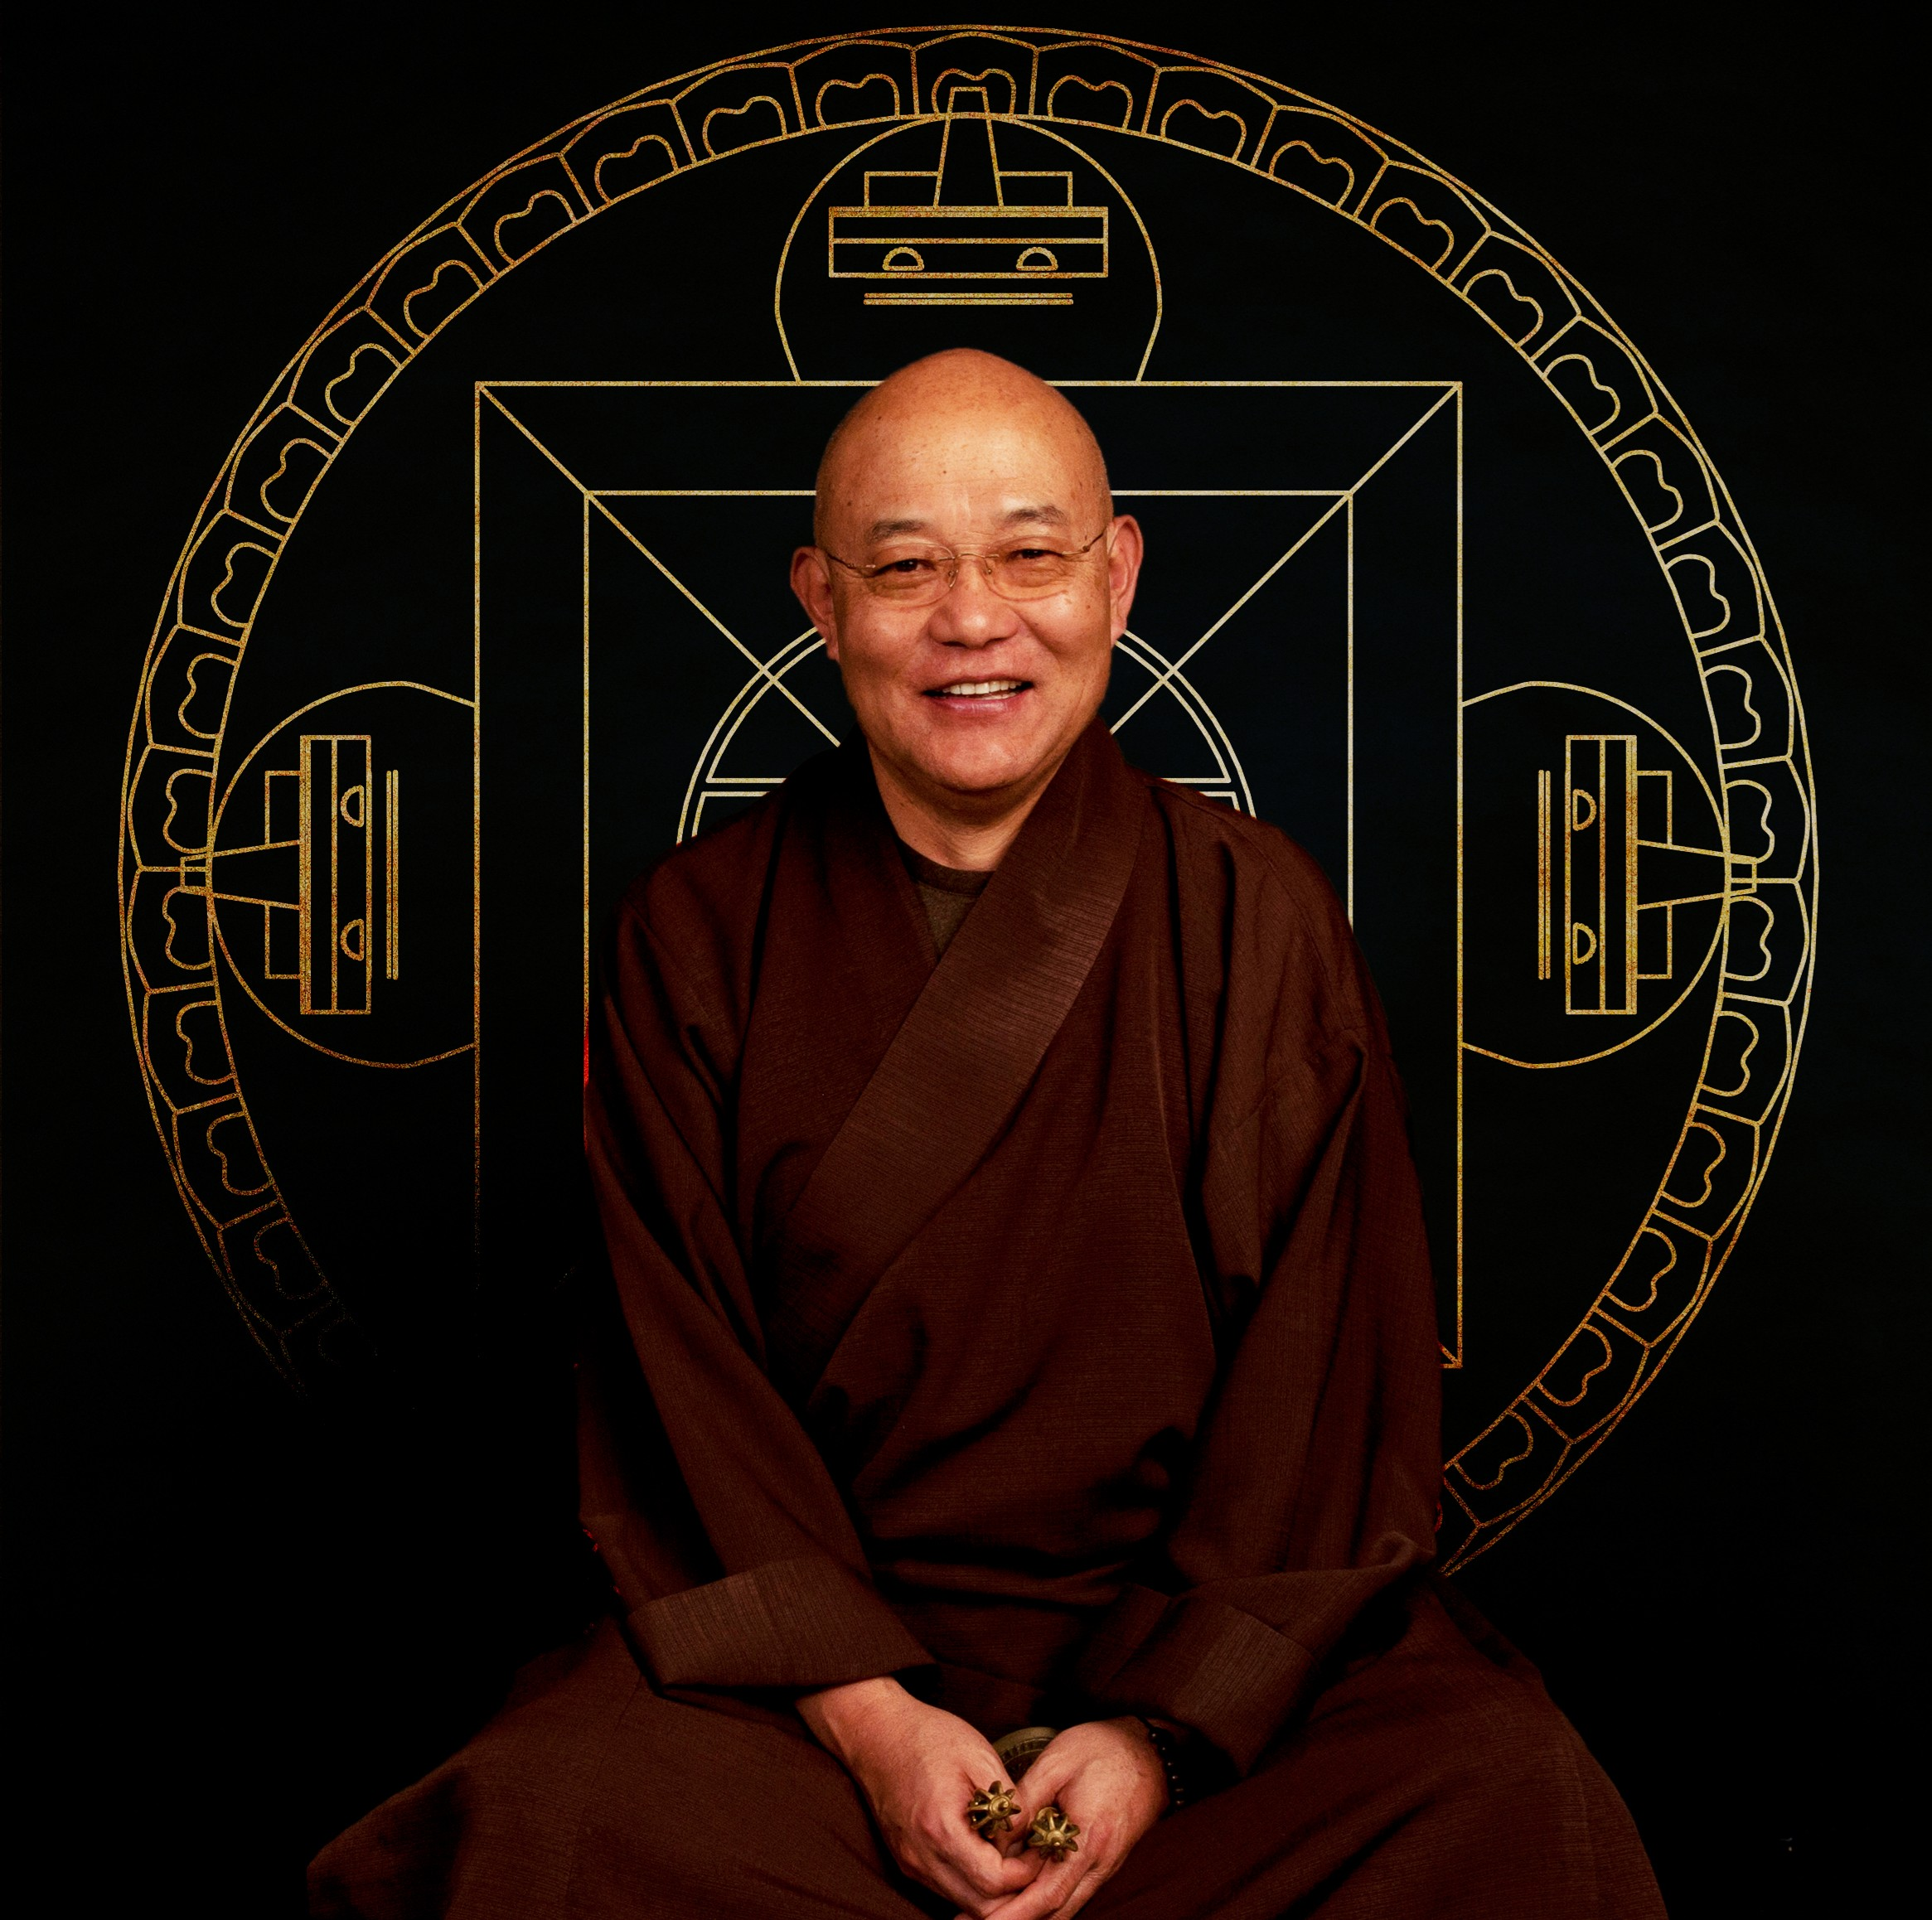 Glencairn Museum to host 3-day workshop on meditation and mandalas